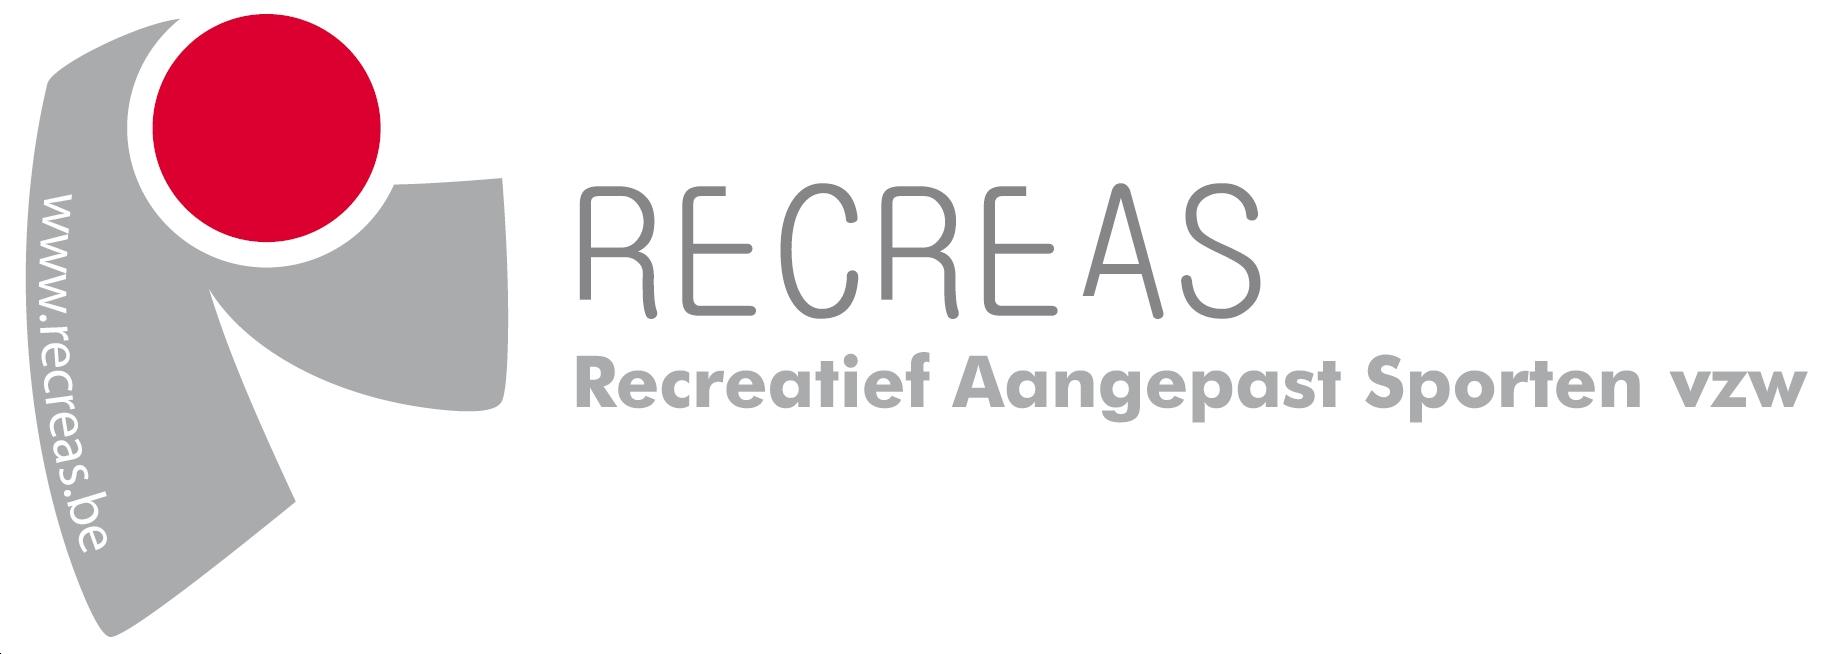 recreas.jpg